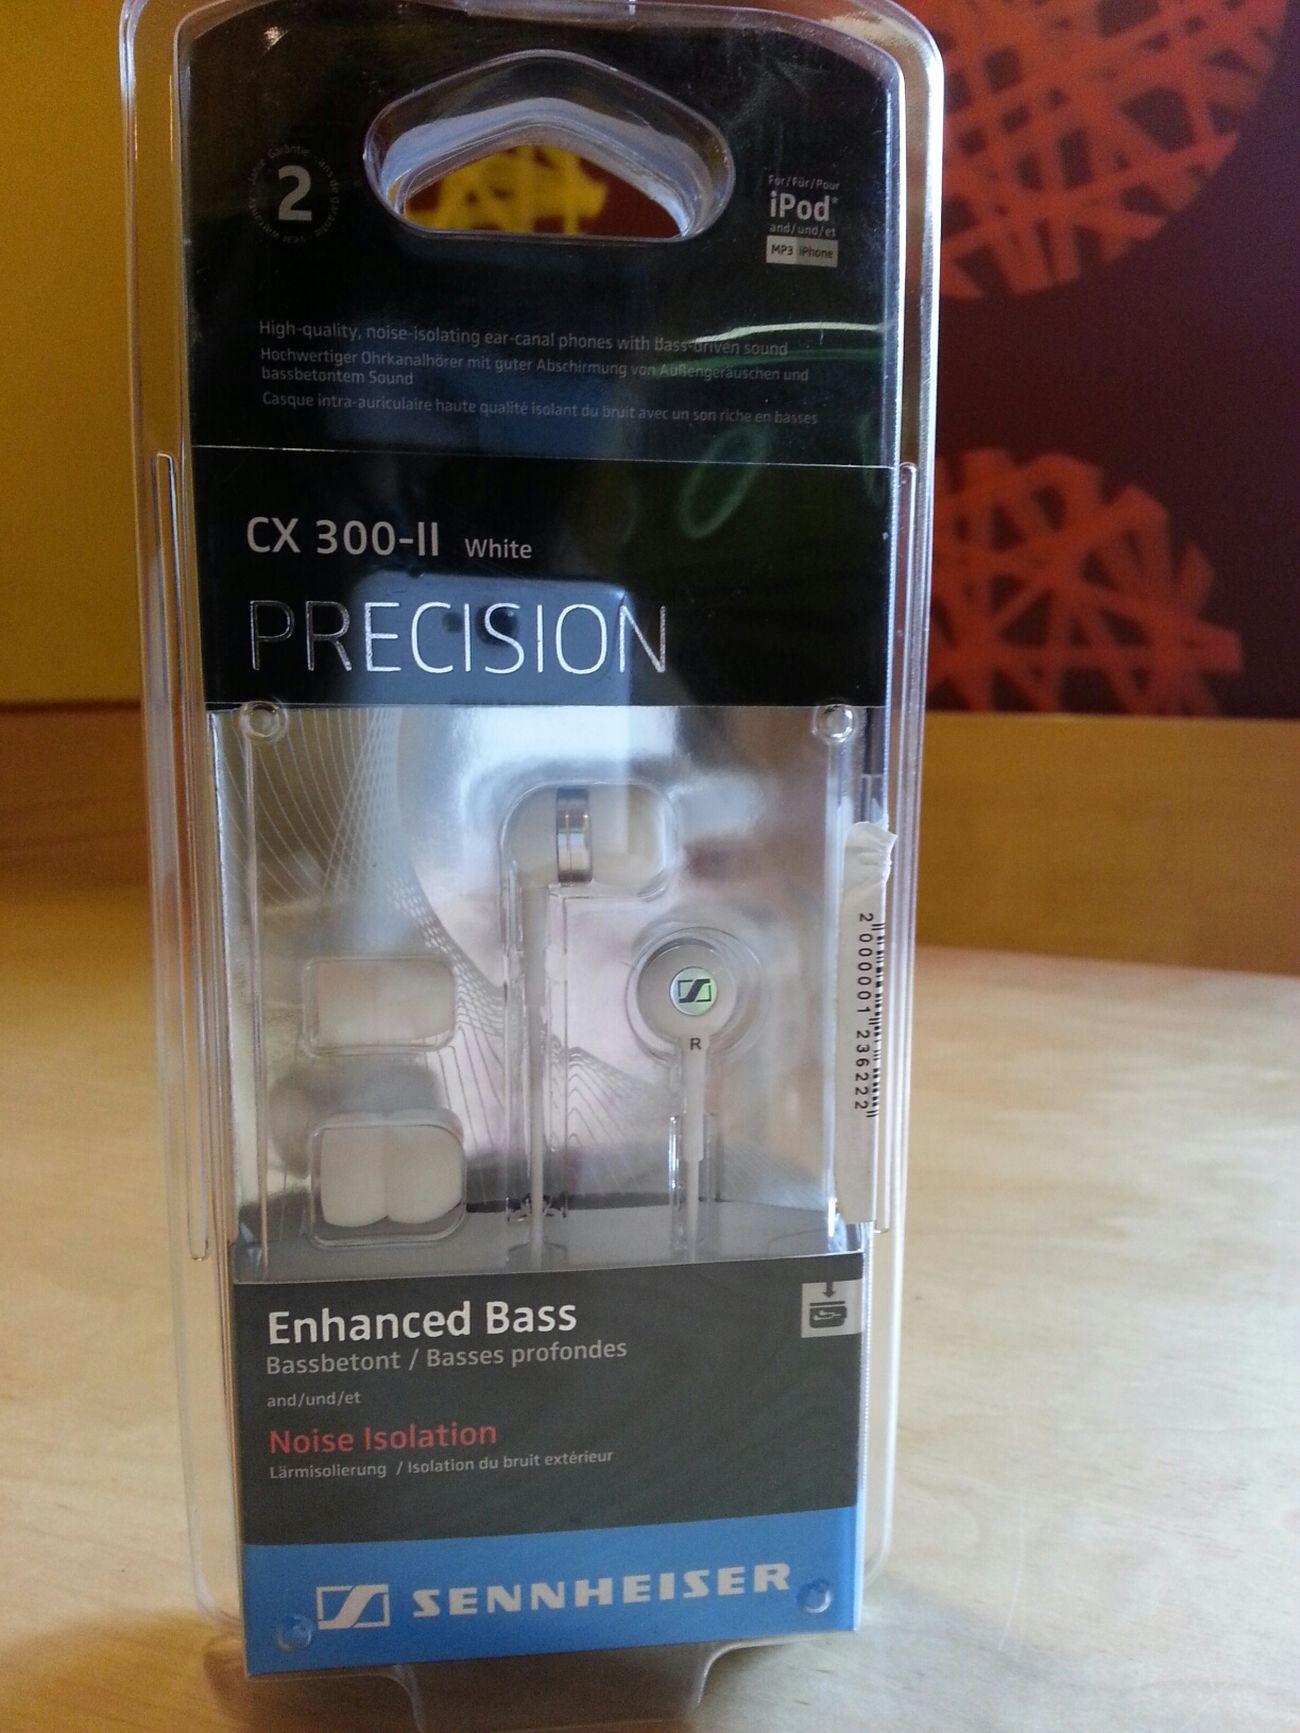 My new original Sennheiser Cx300-ii for Ipod